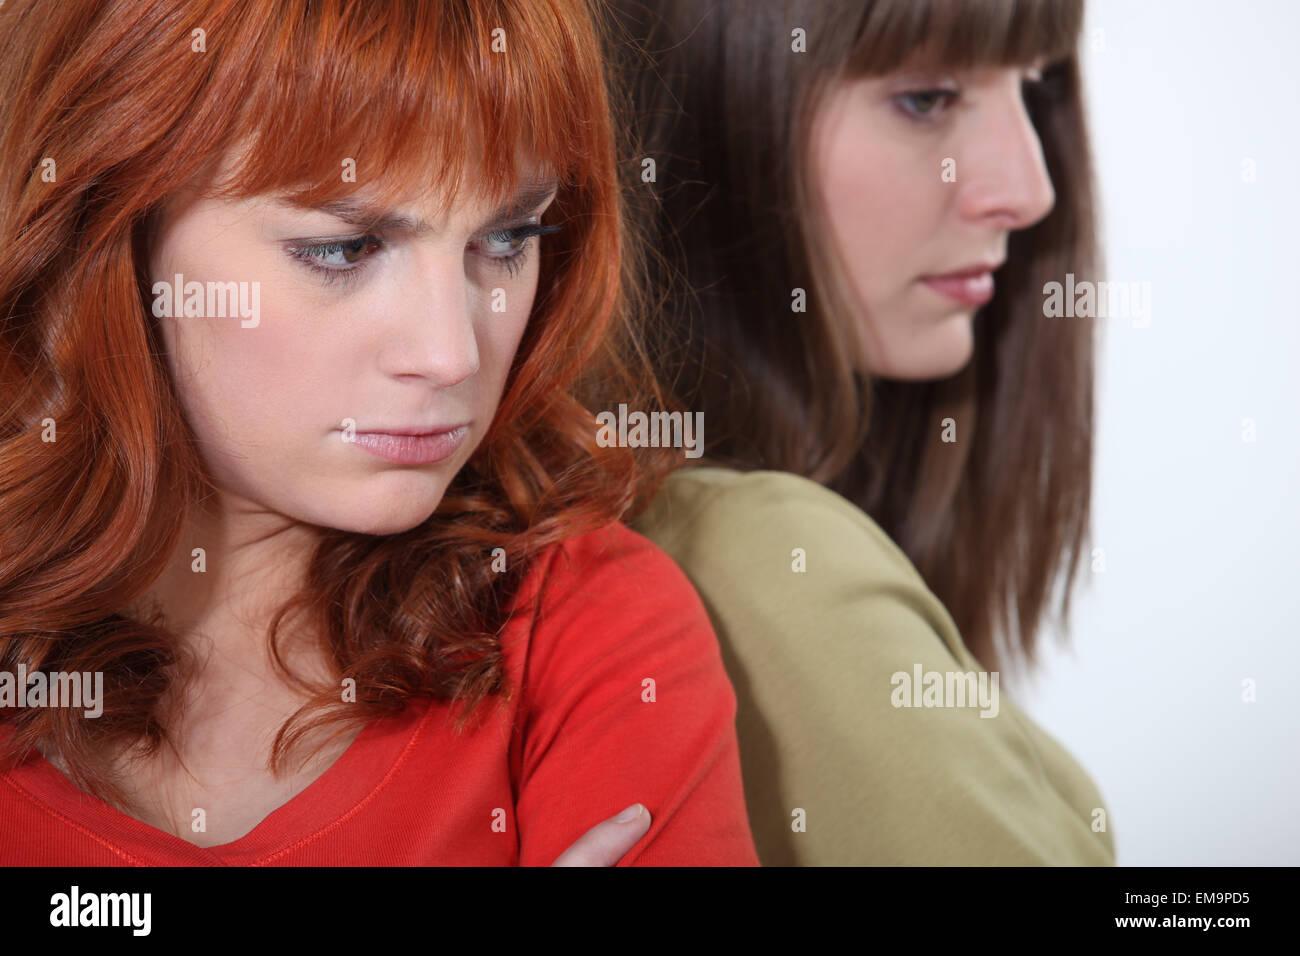 two girlfriends having a quarrel - Stock Image